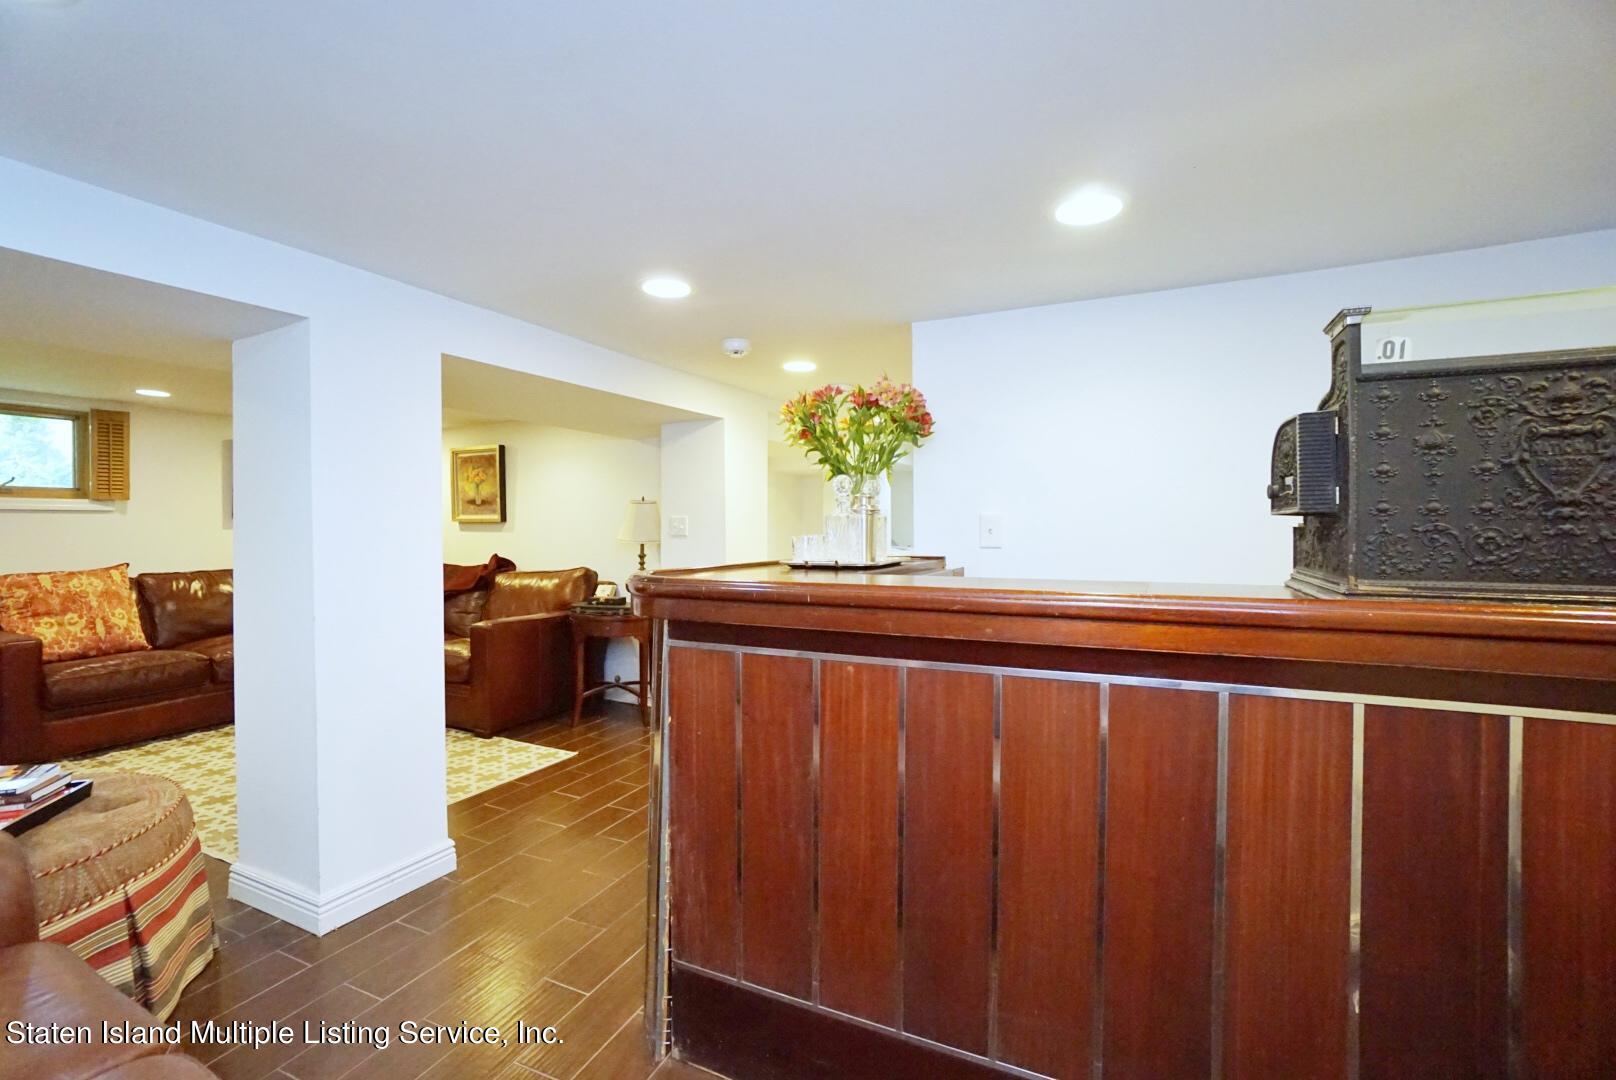 Single Family - Detached 311 Bement Avenue  Staten Island, NY 10310, MLS-1147133-35